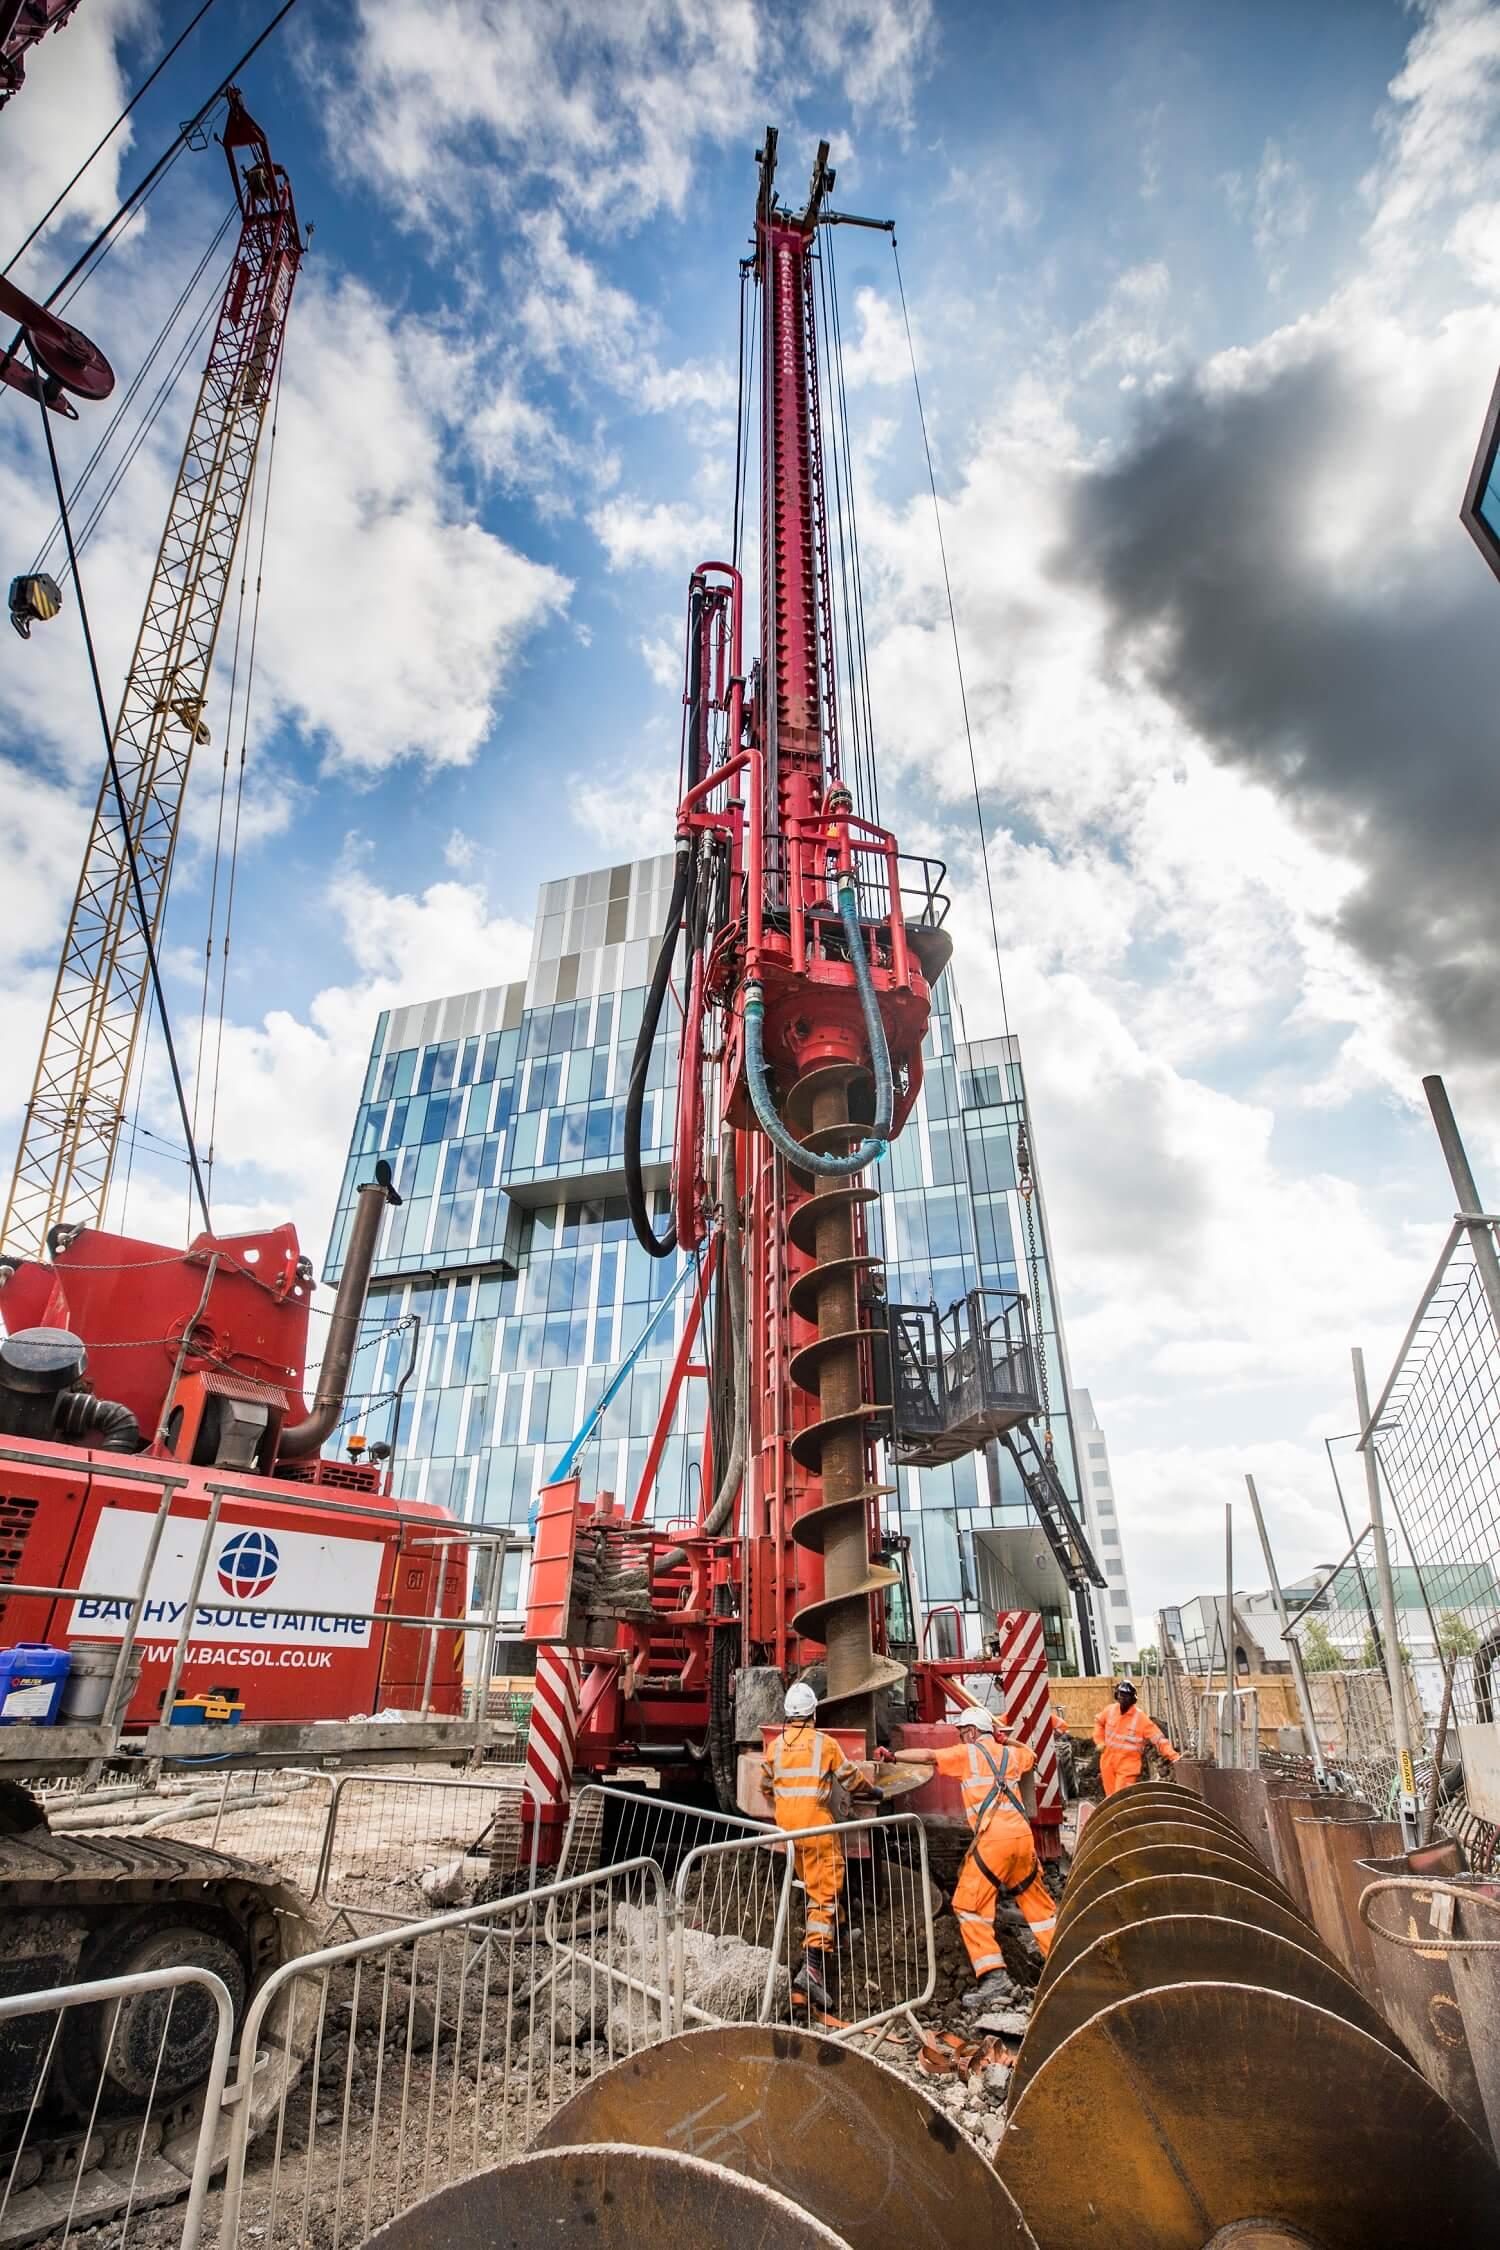 Retaining Wall Solution - Kings Cross S1 Development - Contiguous Pile Wall CFA LDA Piling (3)